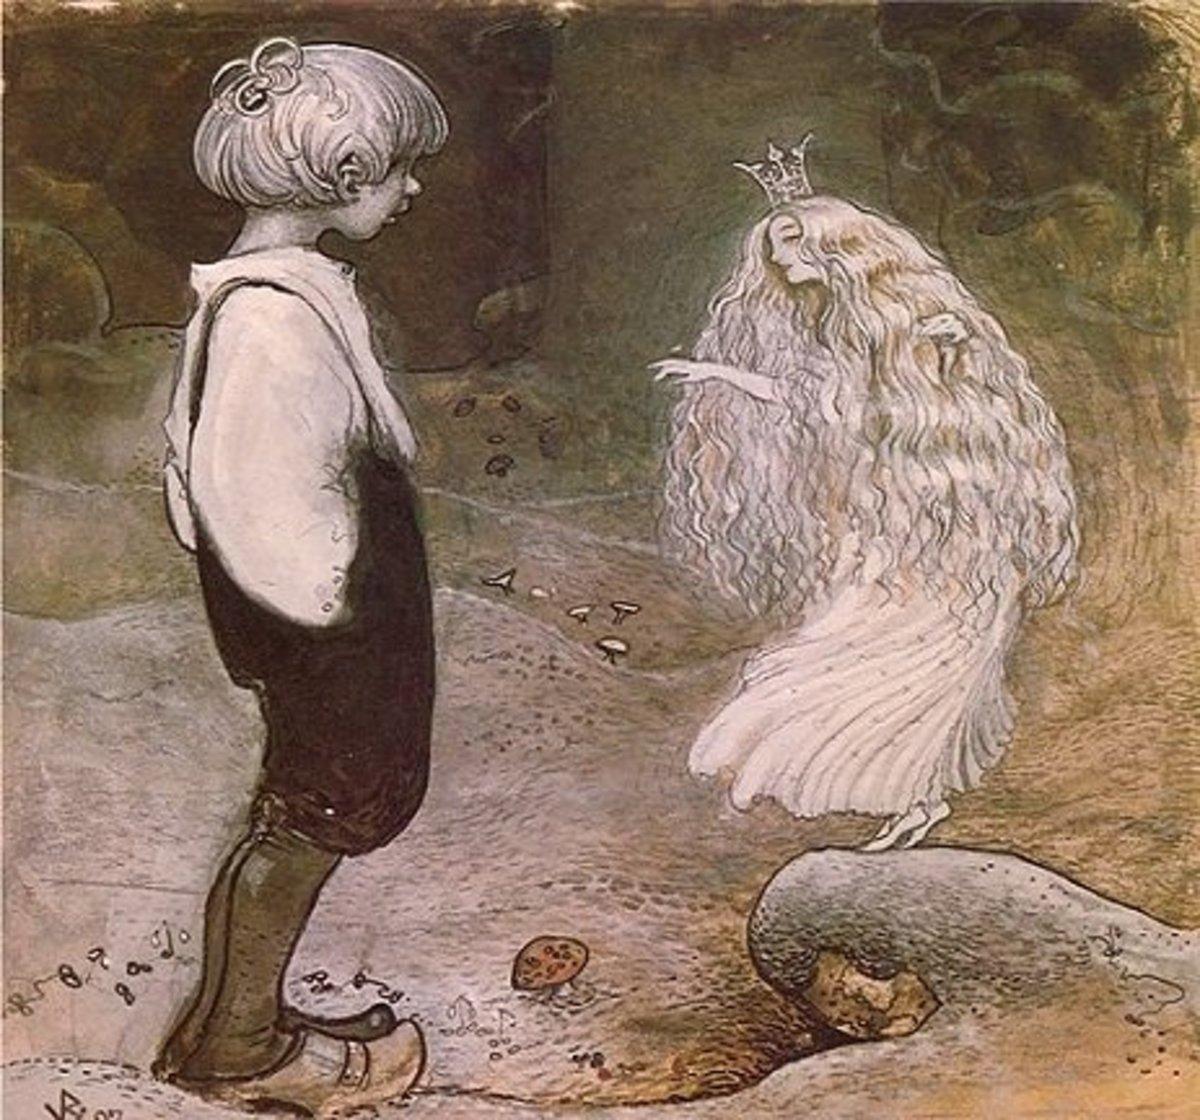 A human boy speaks with an Elven princess.